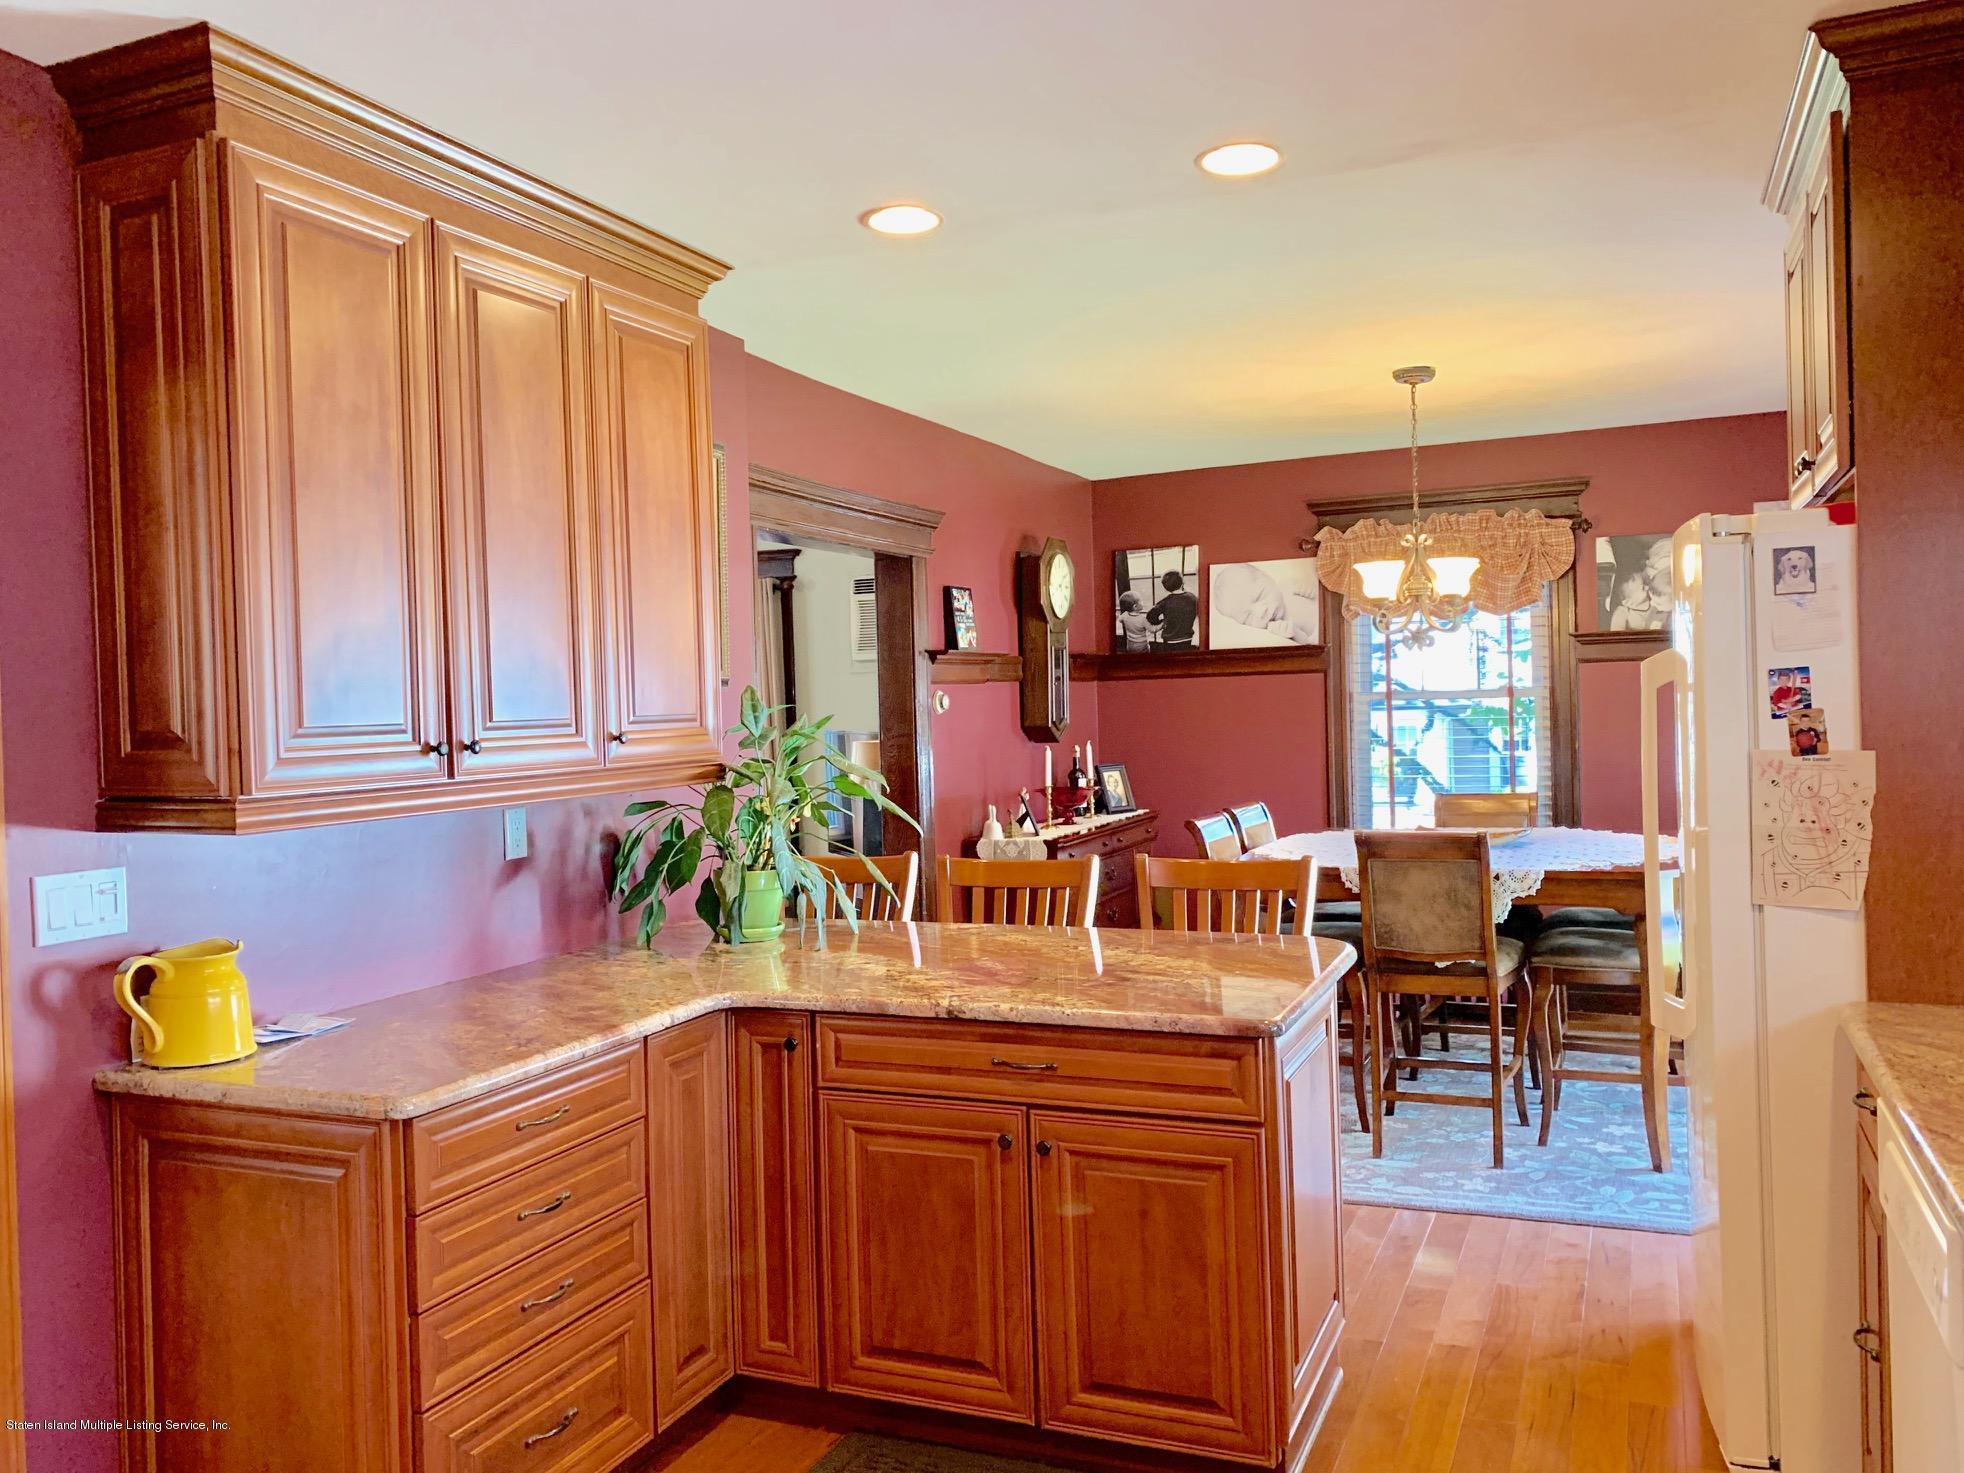 Single Family - Detached 195 Fairview Avenue  Staten Island, NY 10314, MLS-1132423-16